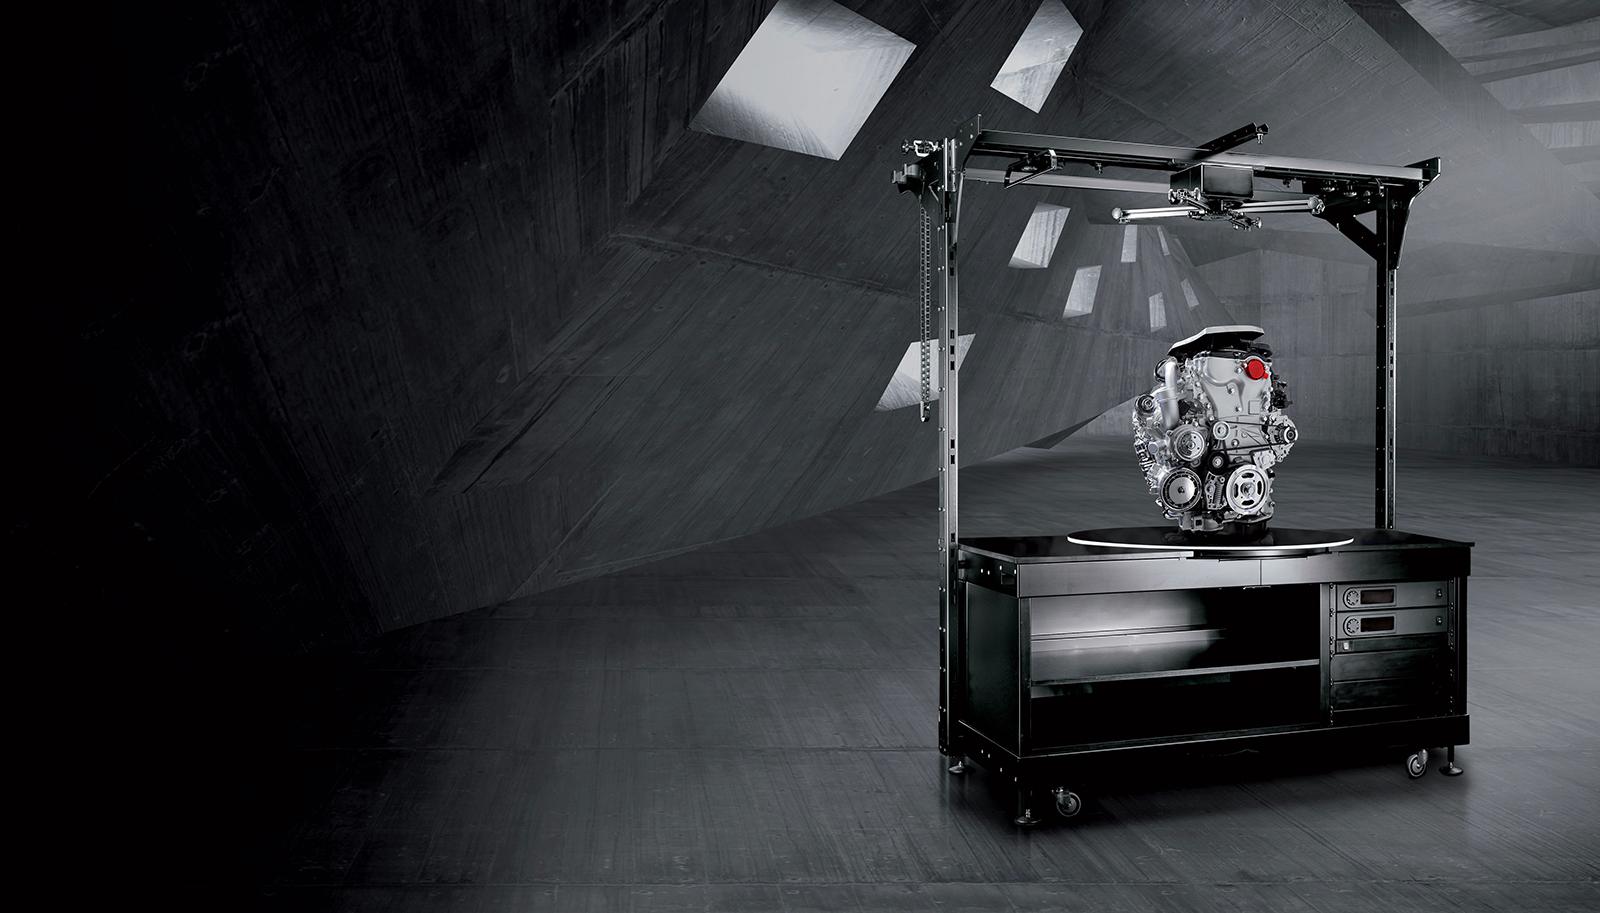 PhotoRobot tavolo robotico pesante con motore automobilistico fotografato